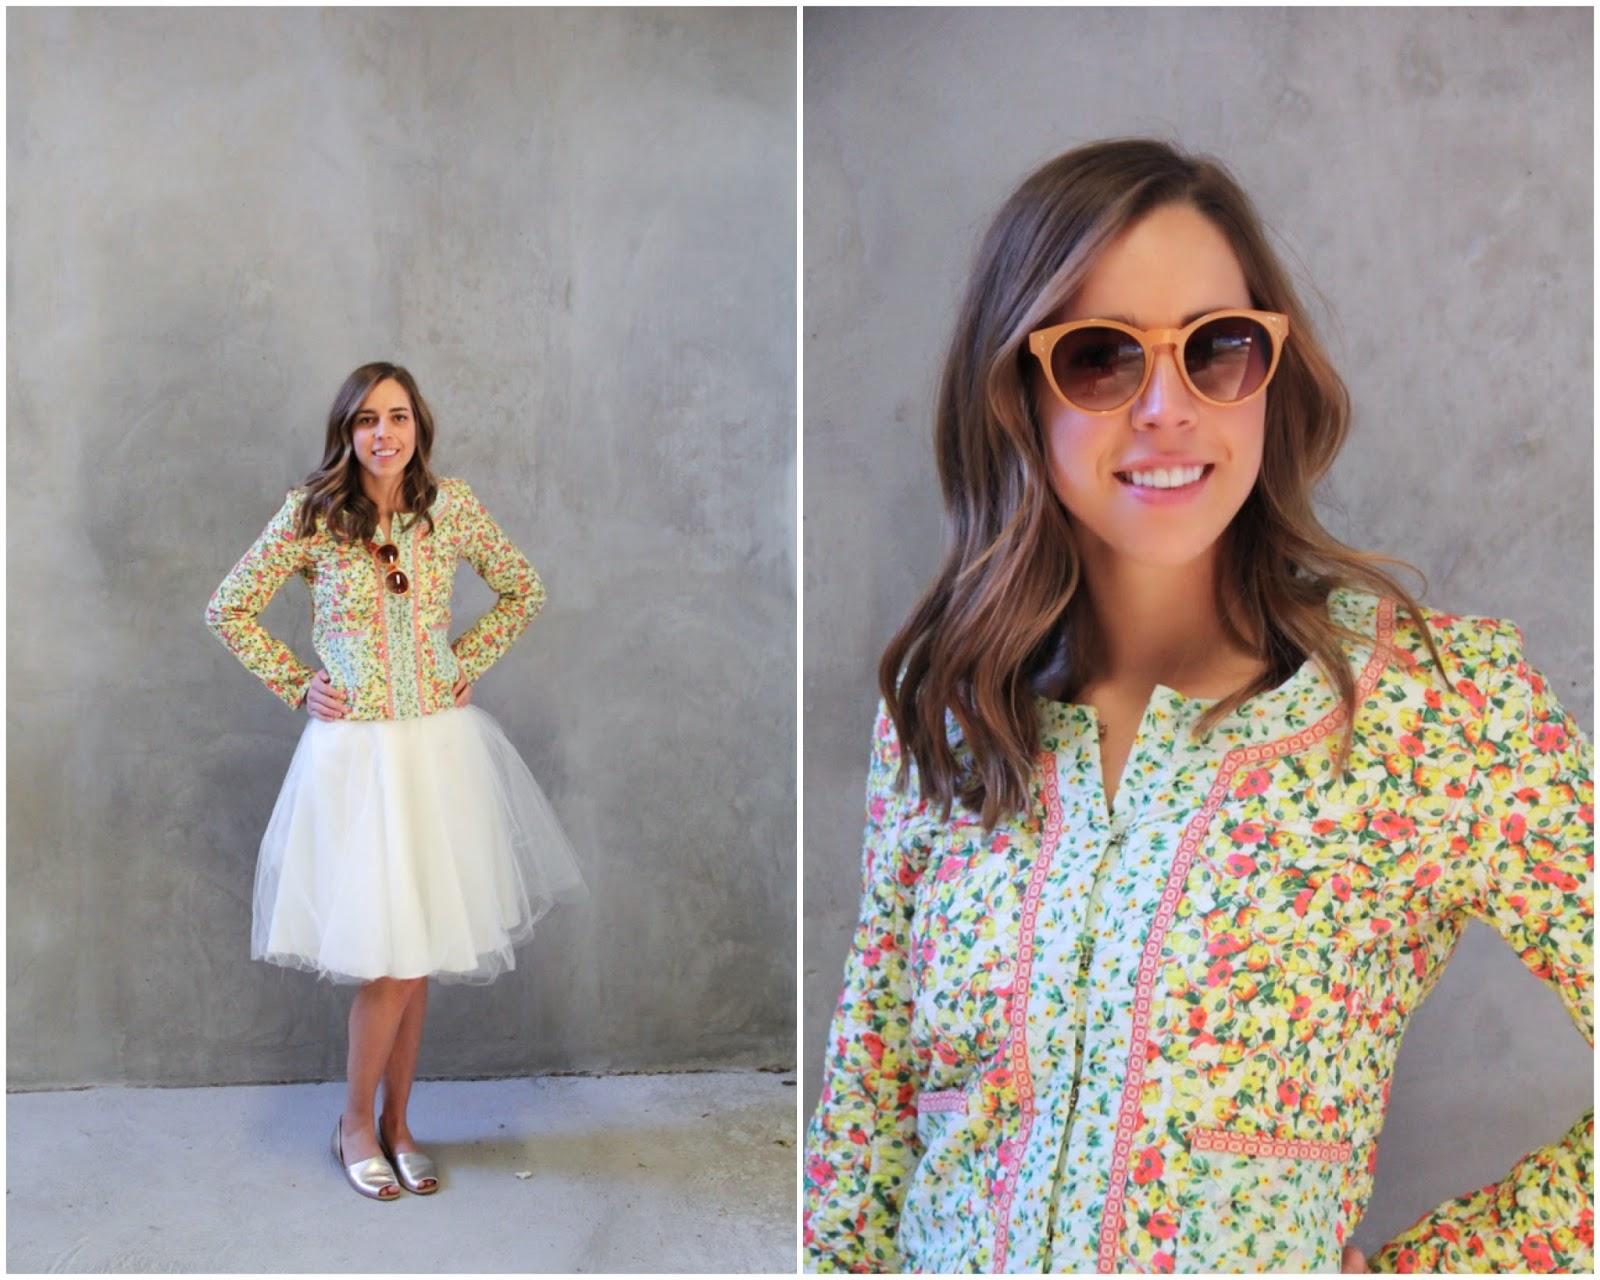 DIY Tulle Skirt, spring fashion, floral print, sunglasses, girl, cream, silver sandals, franco sarto